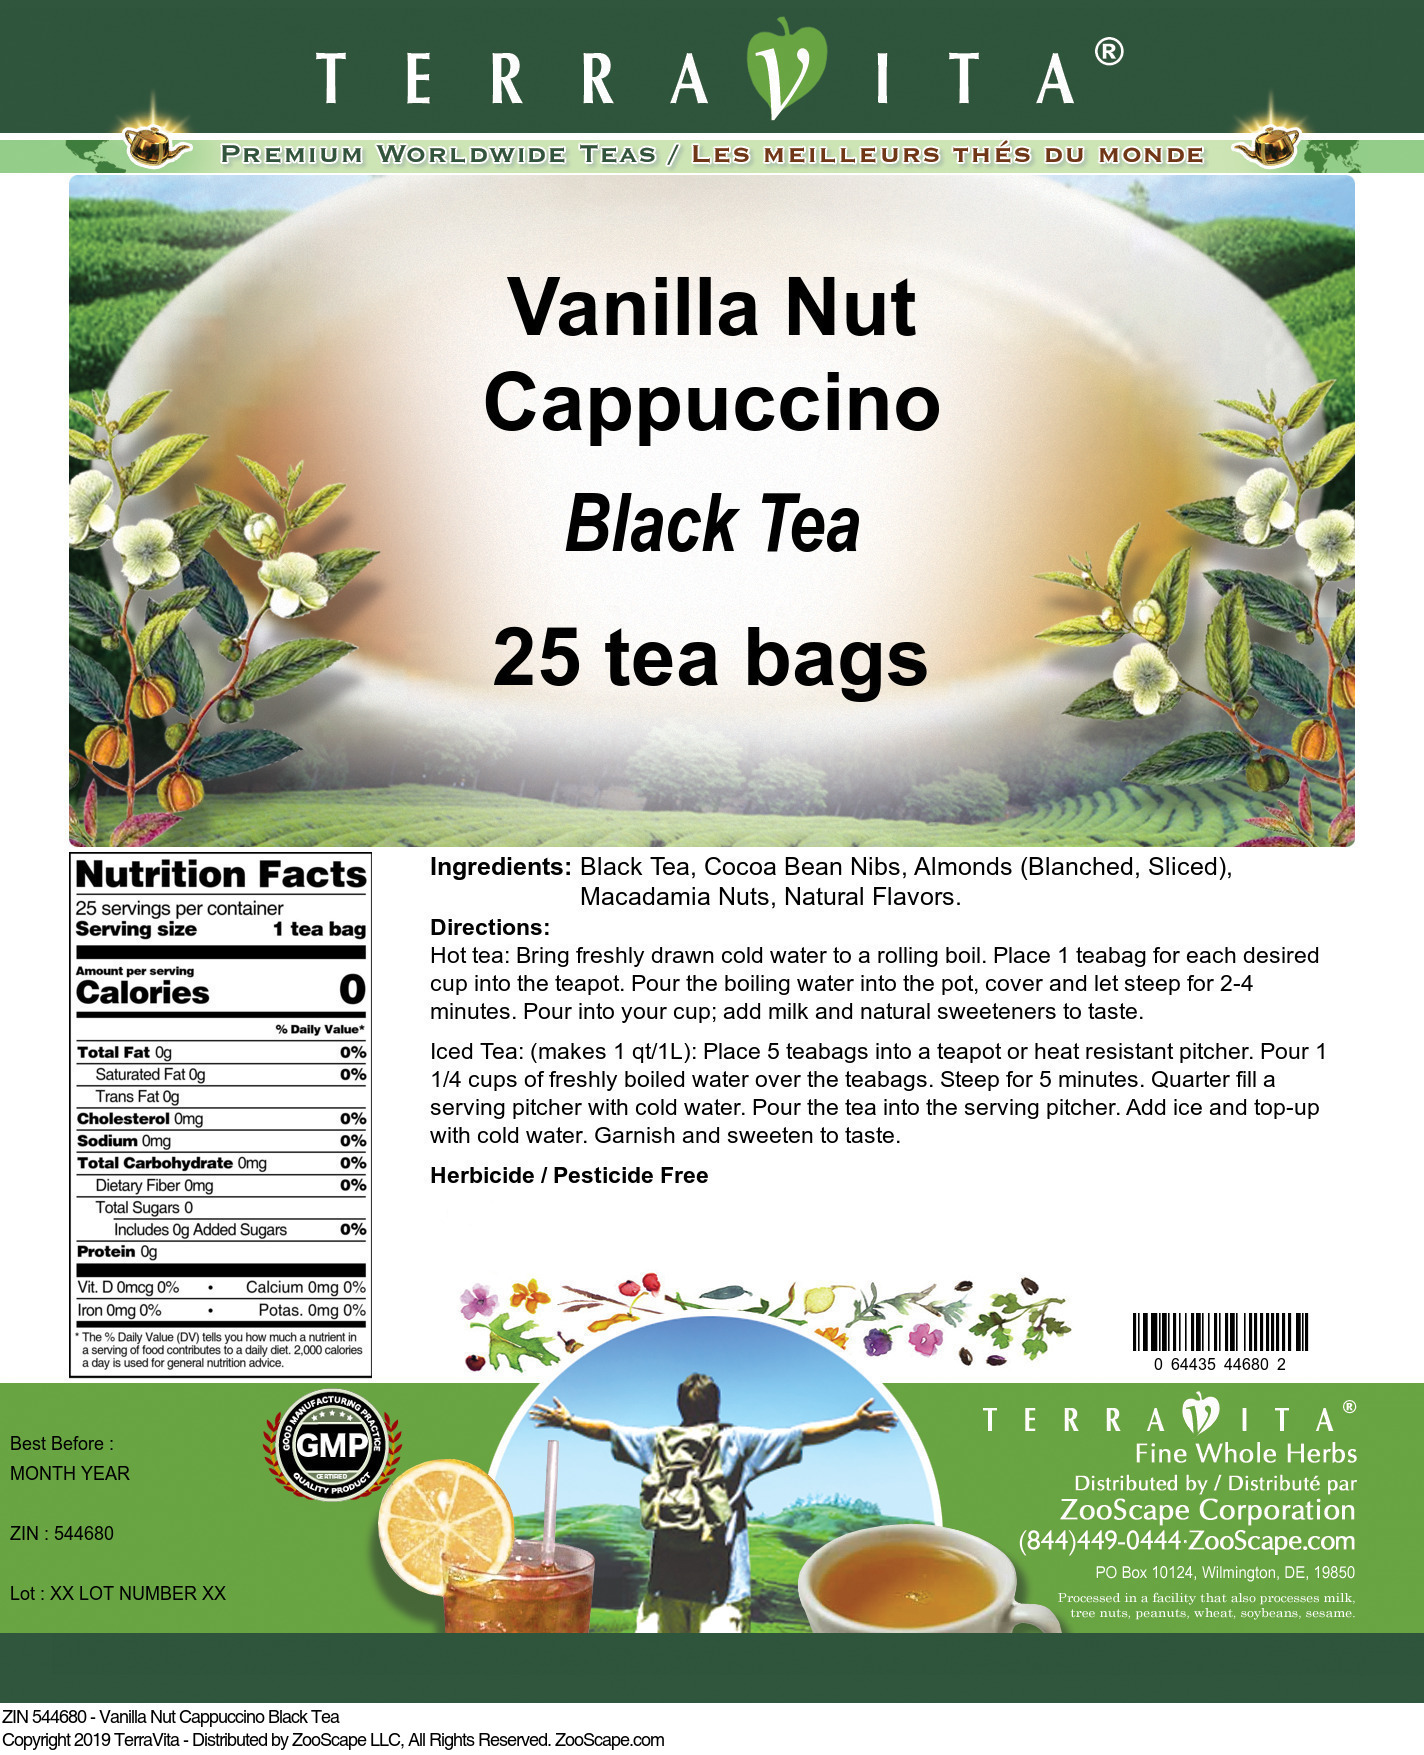 Vanilla Nut Cappuccino Black Tea